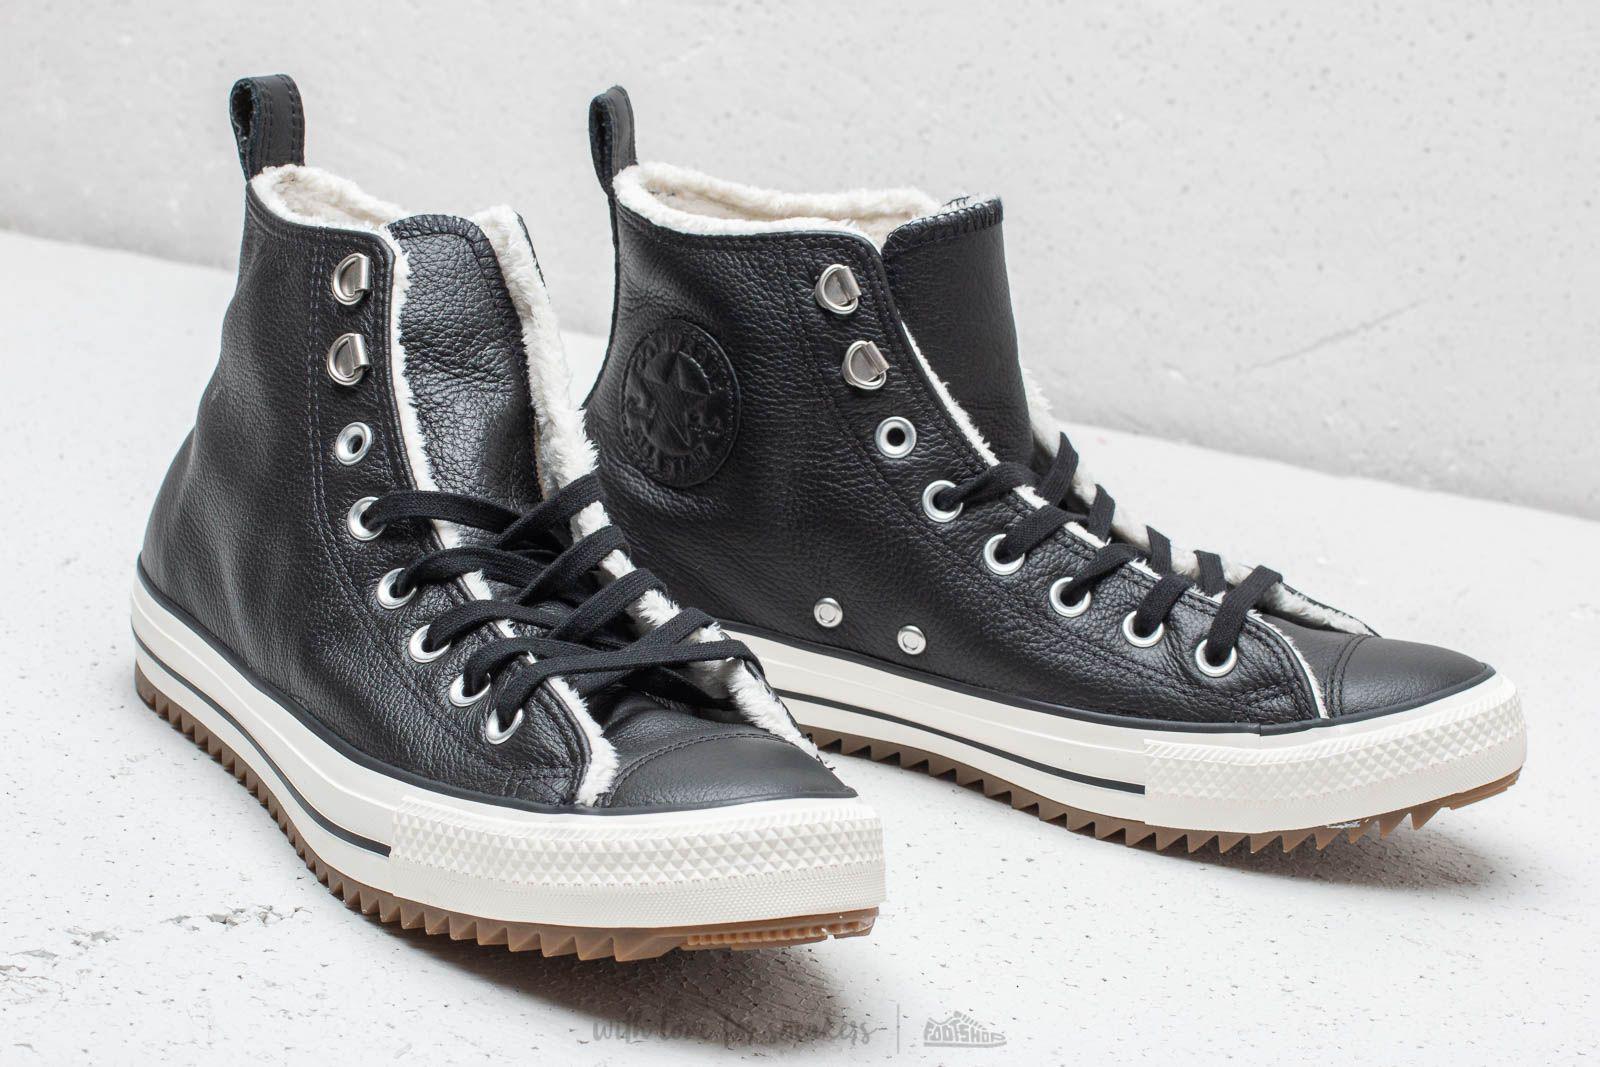 b66758e19a5 Lyst - Converse Chuck Taylor All Stars Hiker Boot High Black  Egret ...